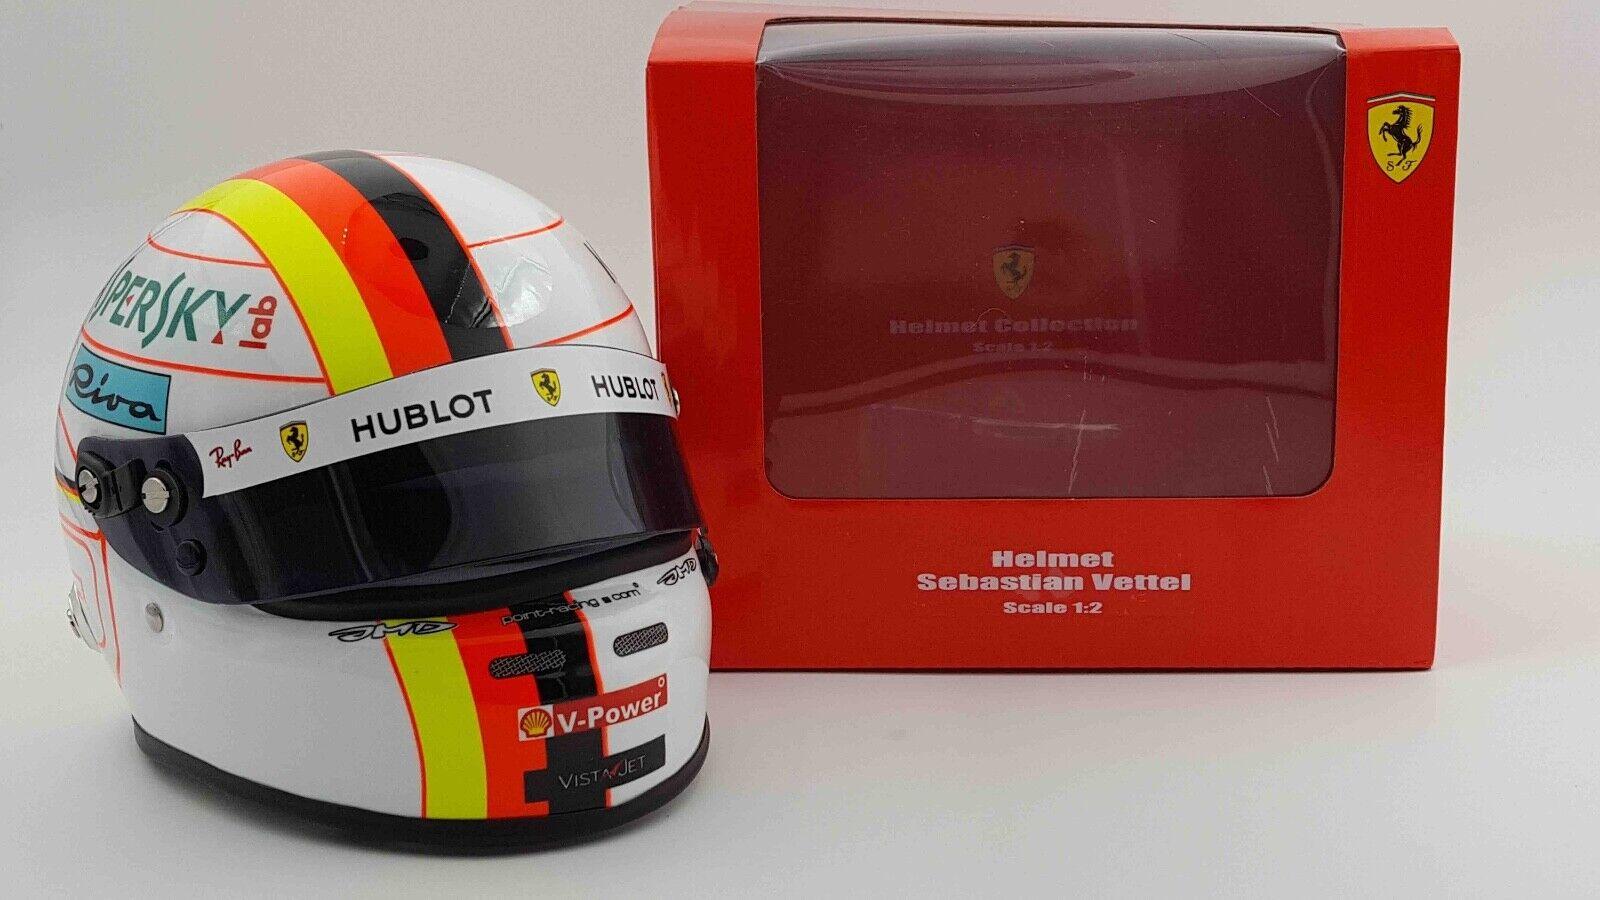 Arai Helmets 1 2 Scale Sebastian Vettel 2019 F1 Miniature Scale Helmet Model